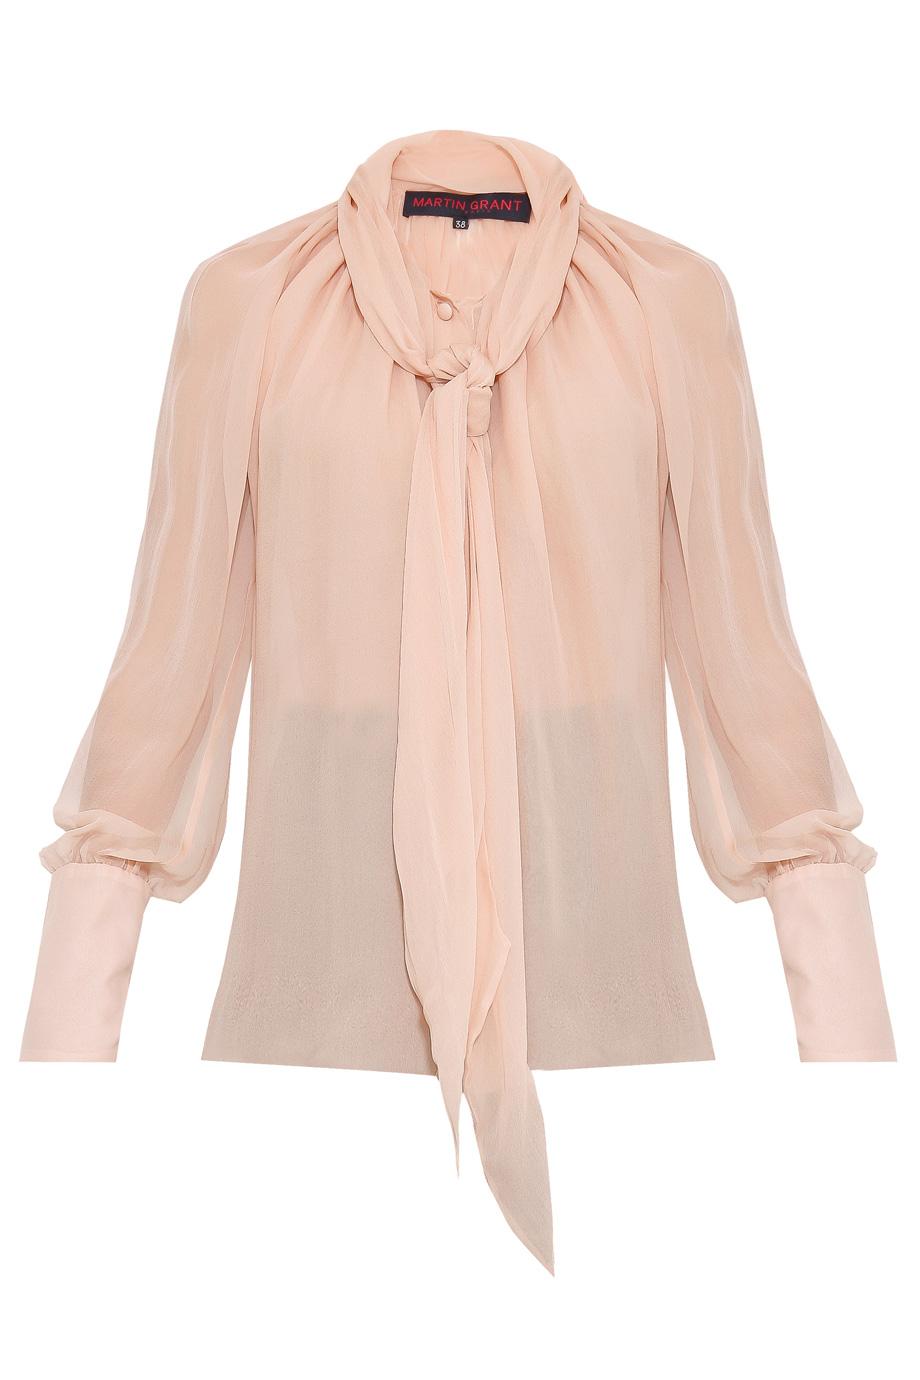 Martin Grant Scarf Collar Silk Blouse In Pink Lyst